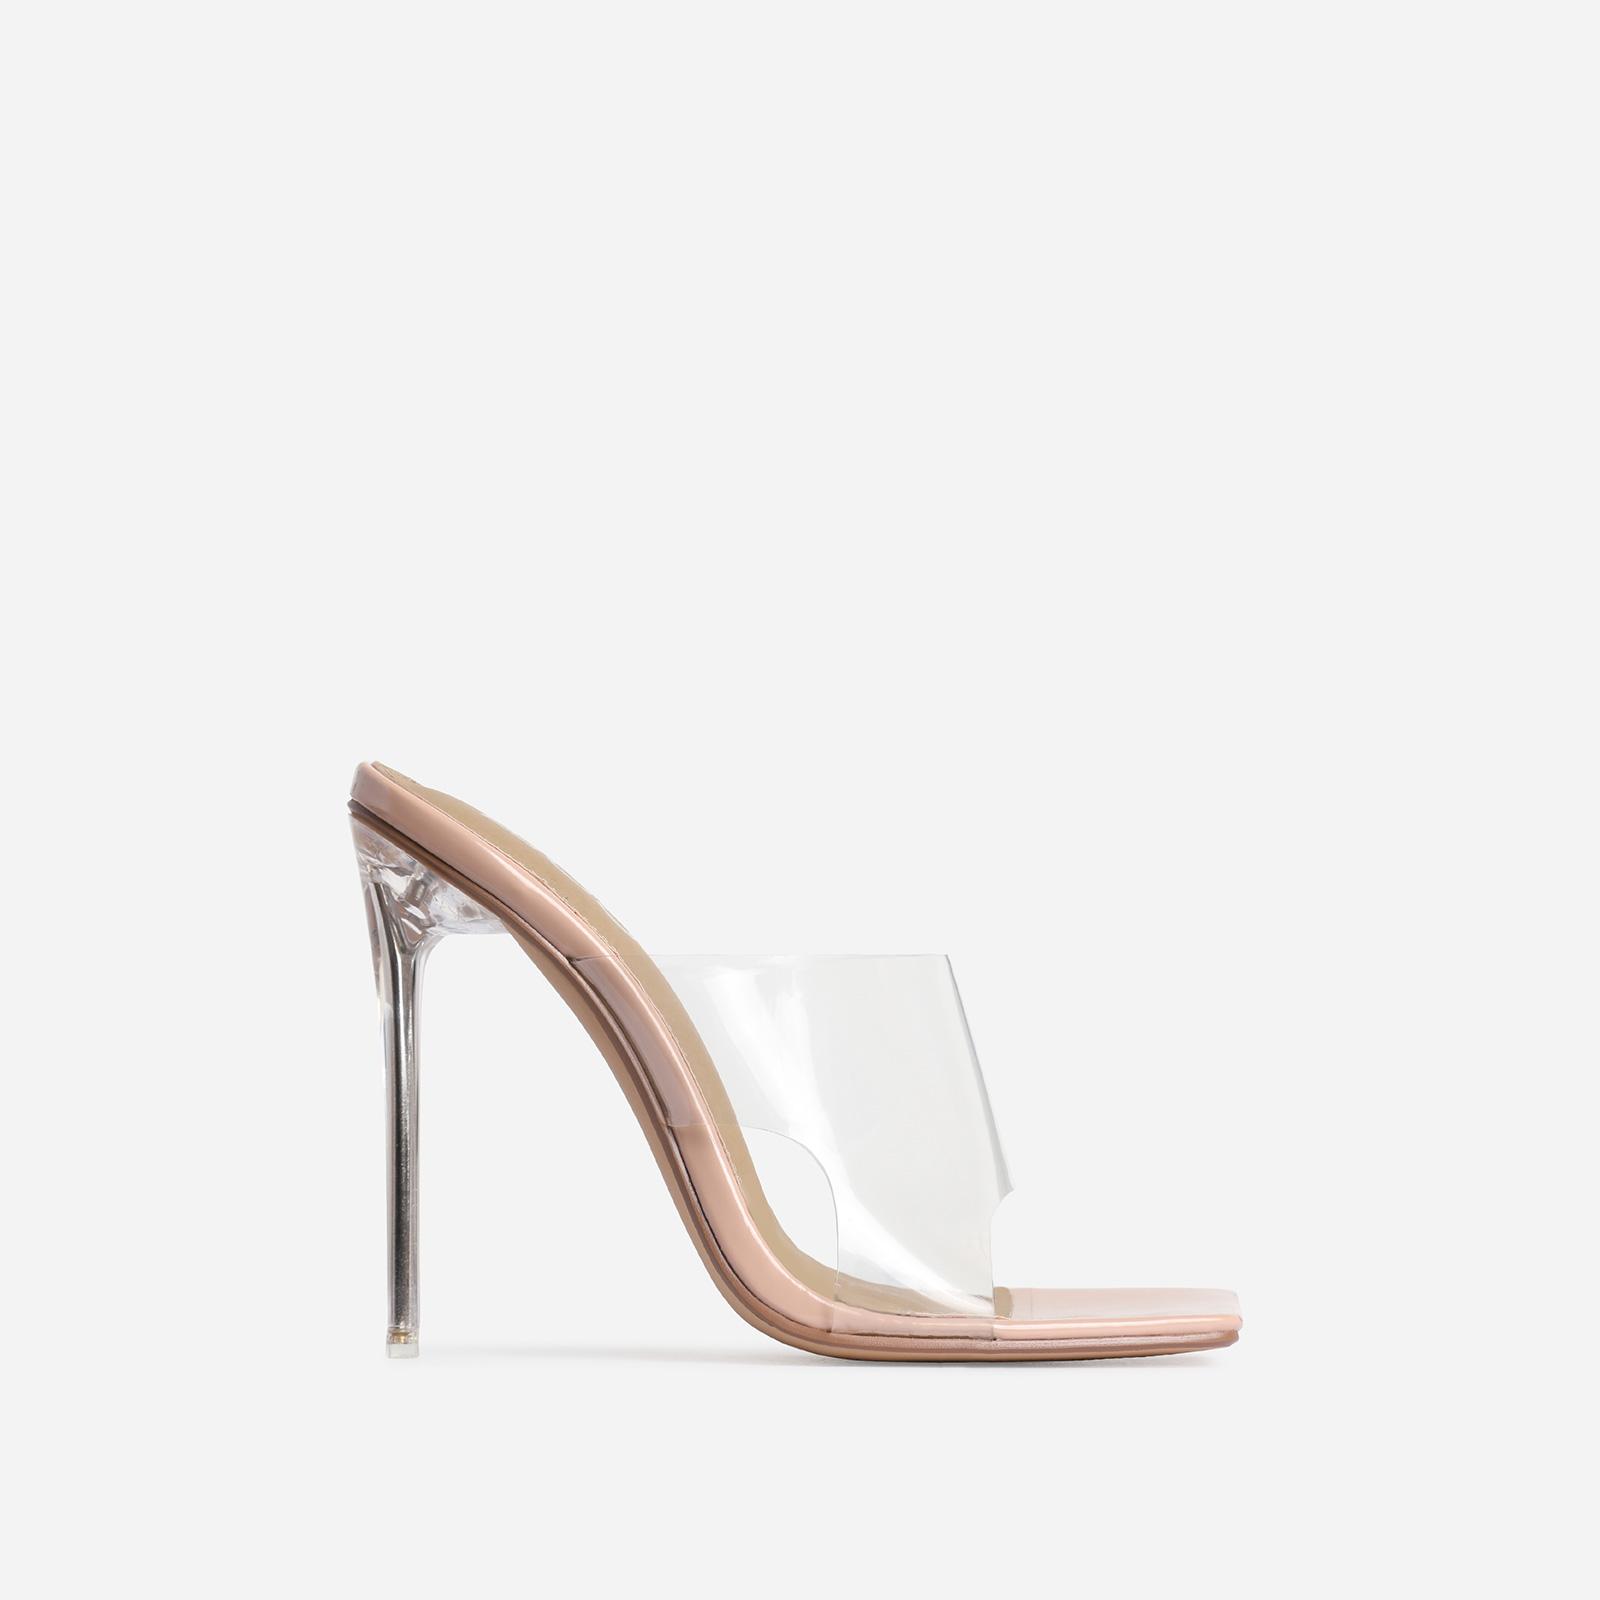 River Clear Perspex Square Peep Toe Heel Mule In Nude Patent